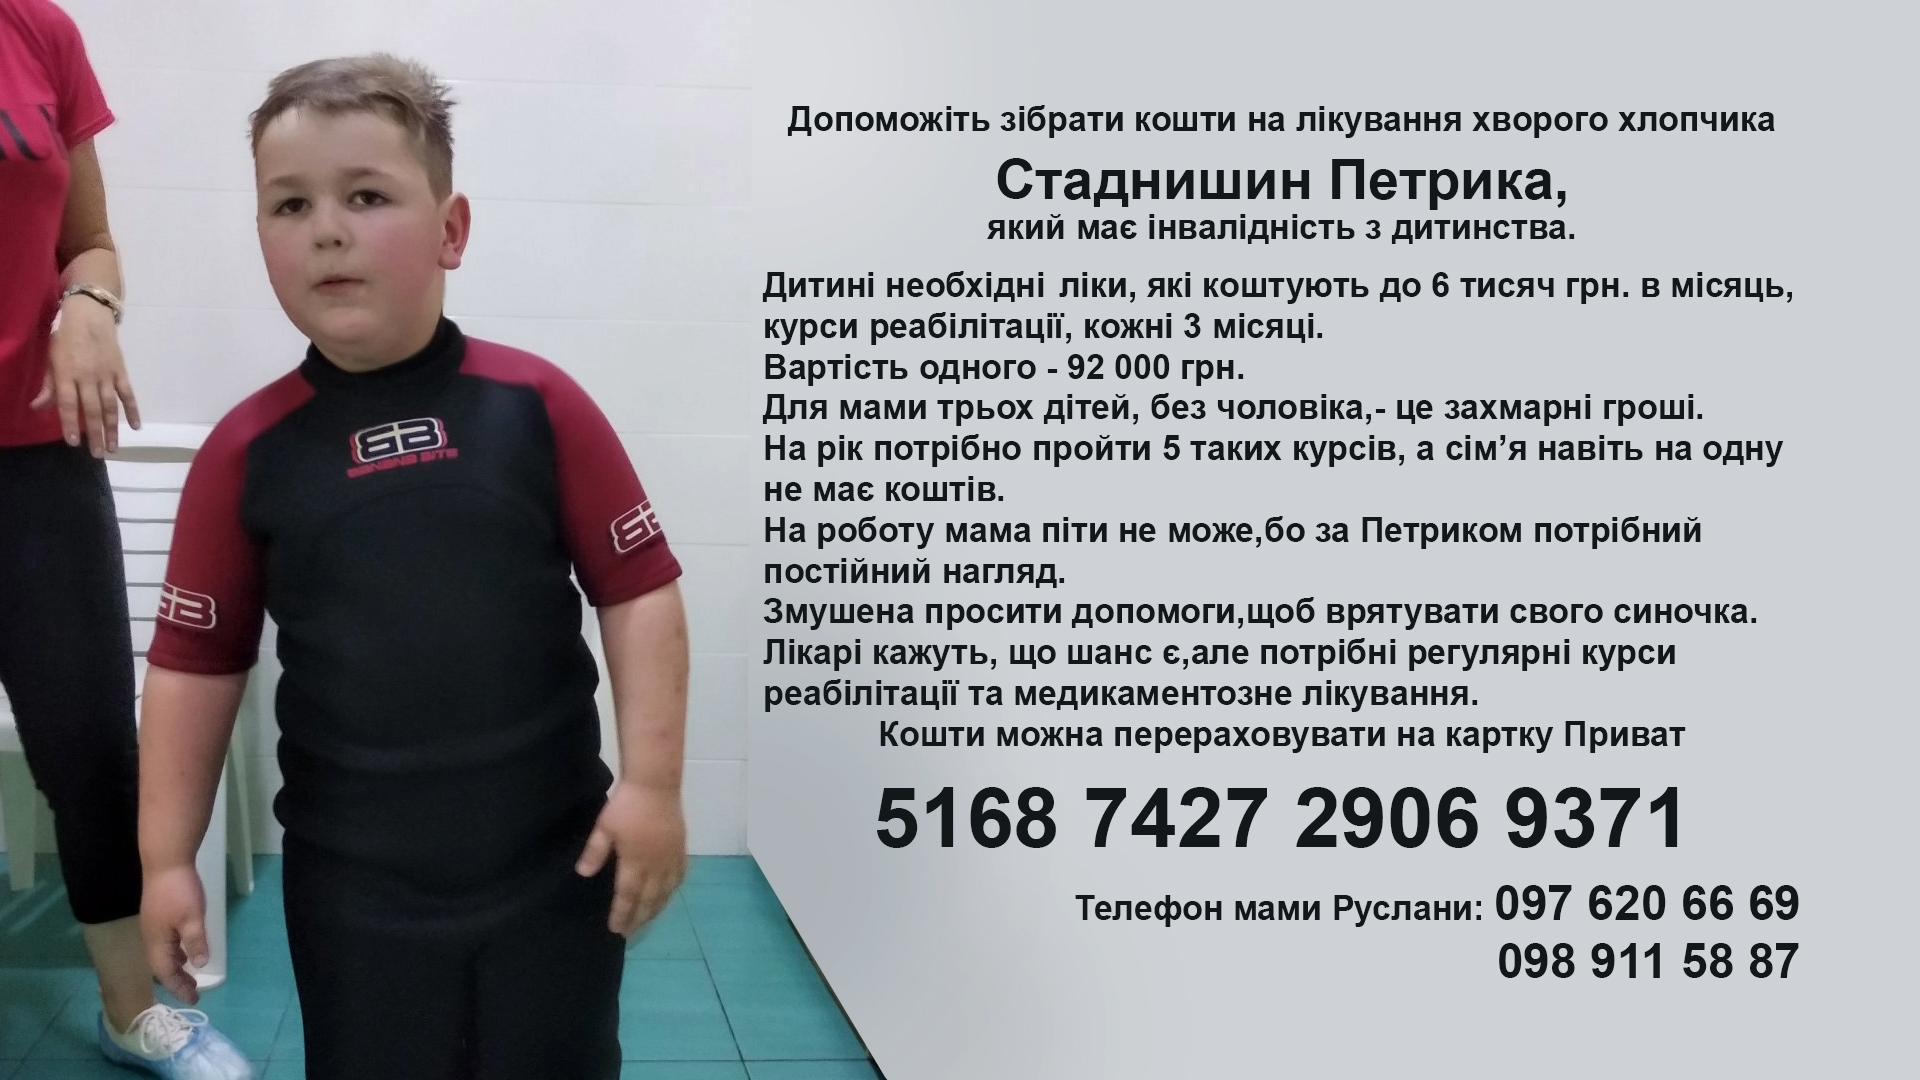 Допомоги потребує Стаднишин Петрик